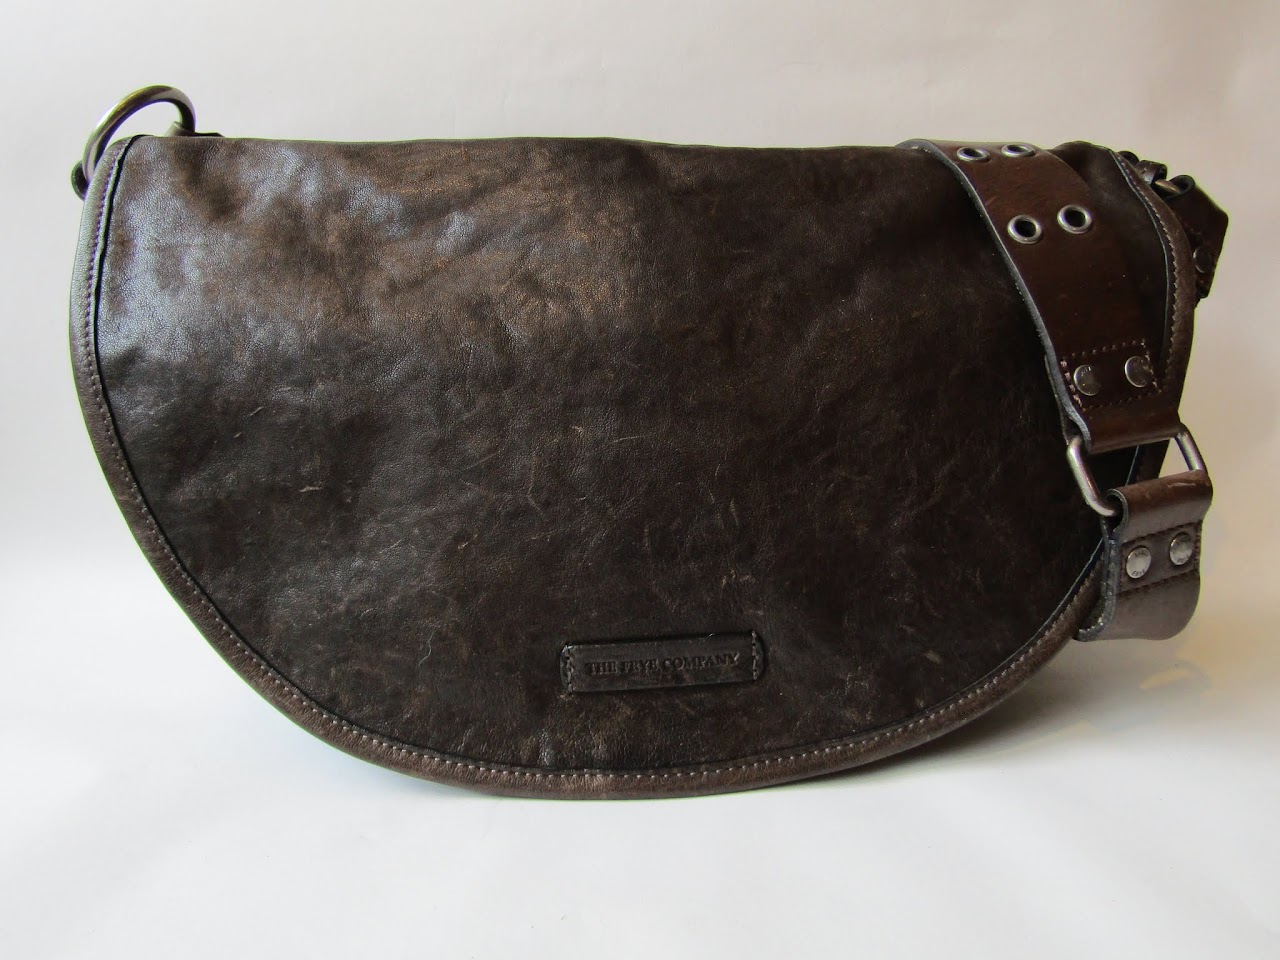 Frye Saddle Bag